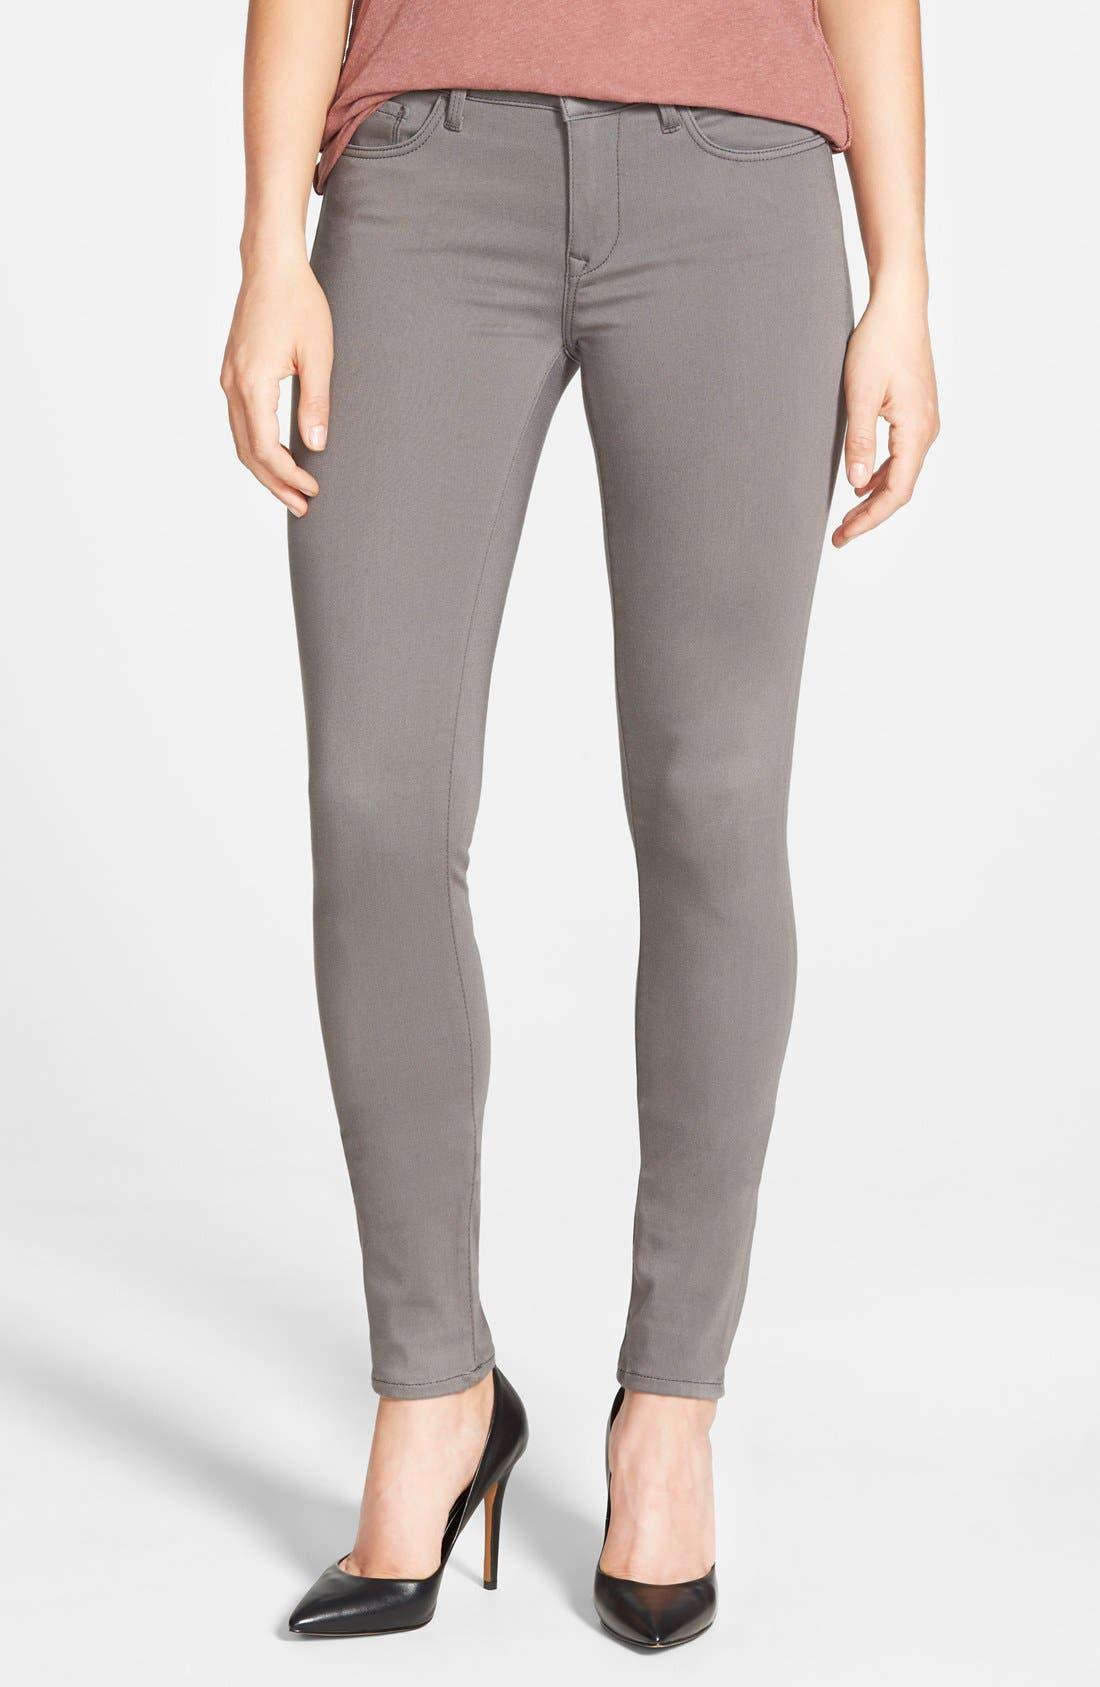 MaviJeans Gold 'Adriana' Stretch Super Skinny Jeans (Smoke Gold Sateen)